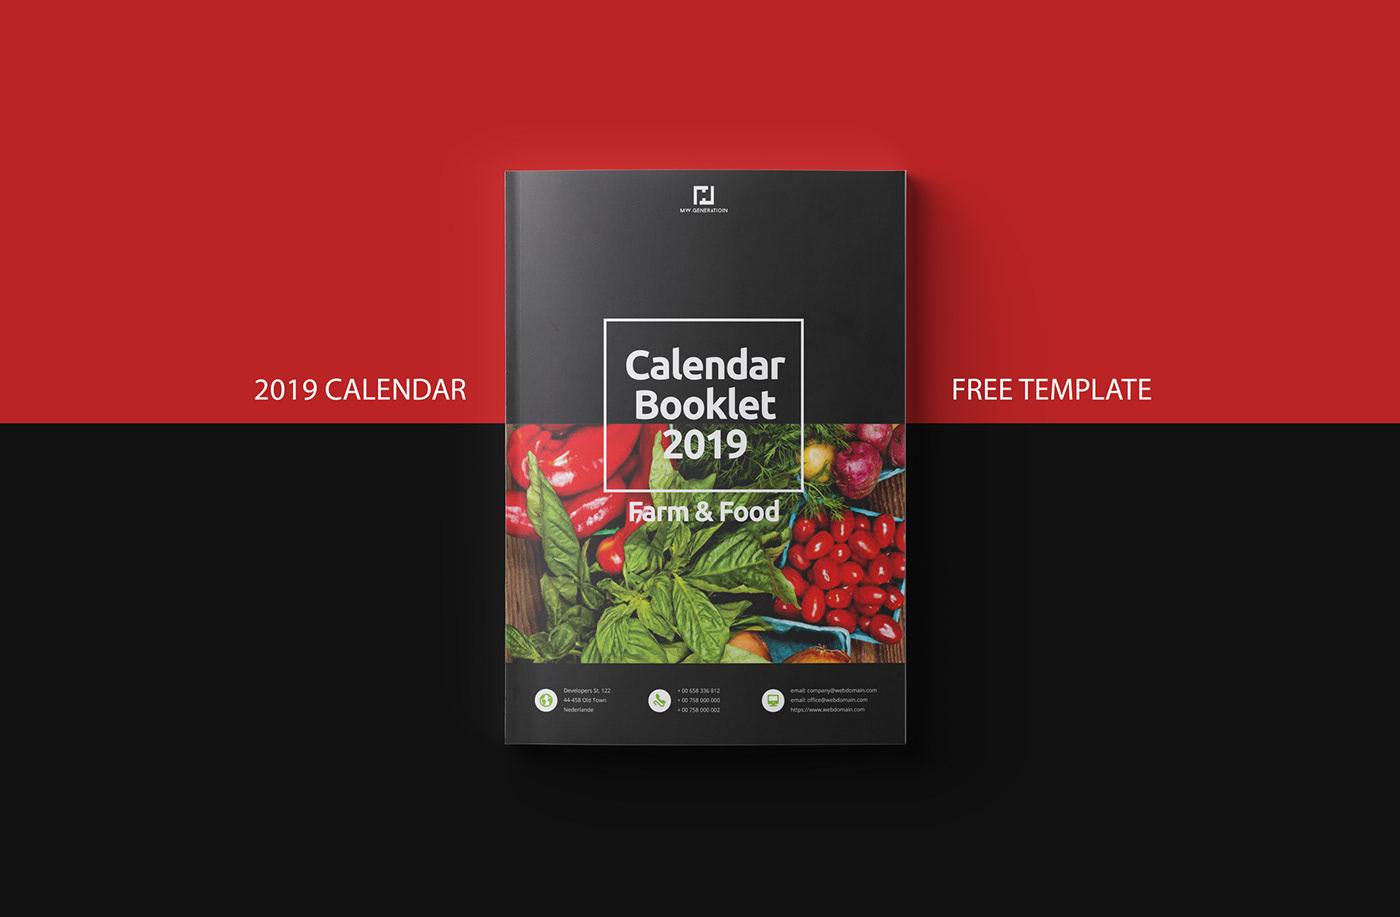 Calendario 2019 Illustrator.Free Calendar 2019 Indesign Template On Behance